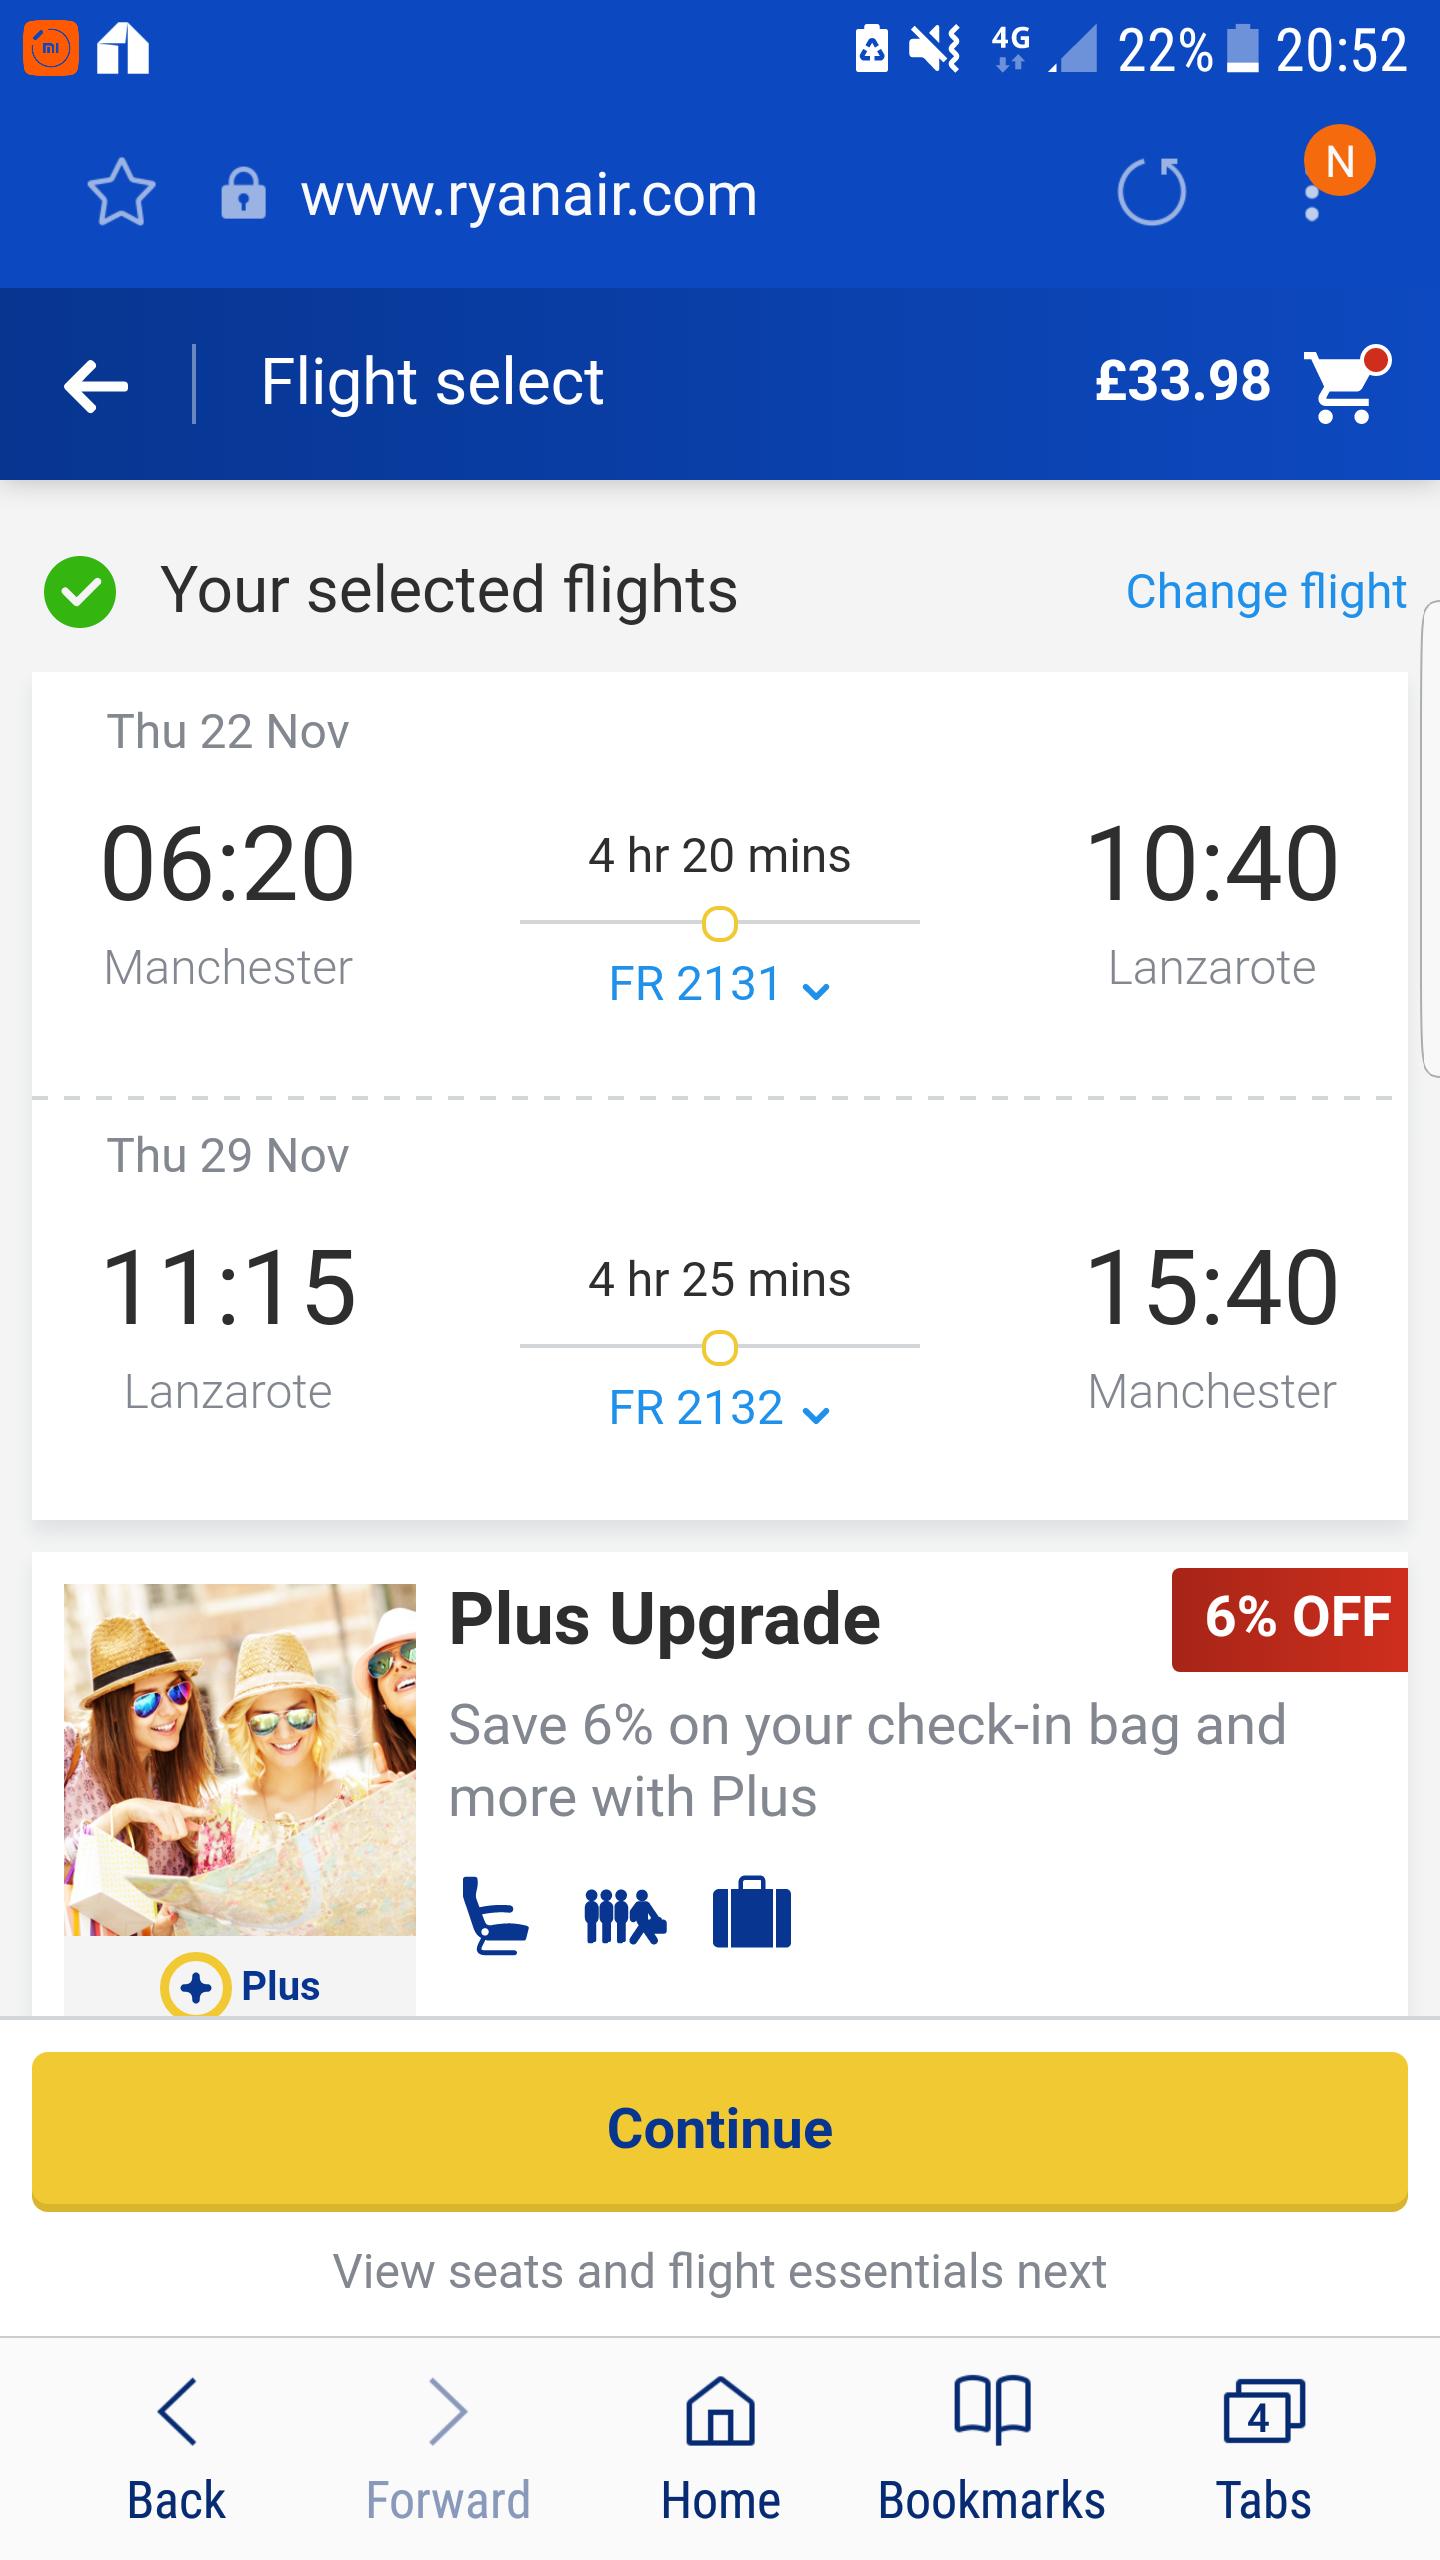 Lanzarote £33.98 Return Flights from Manchester